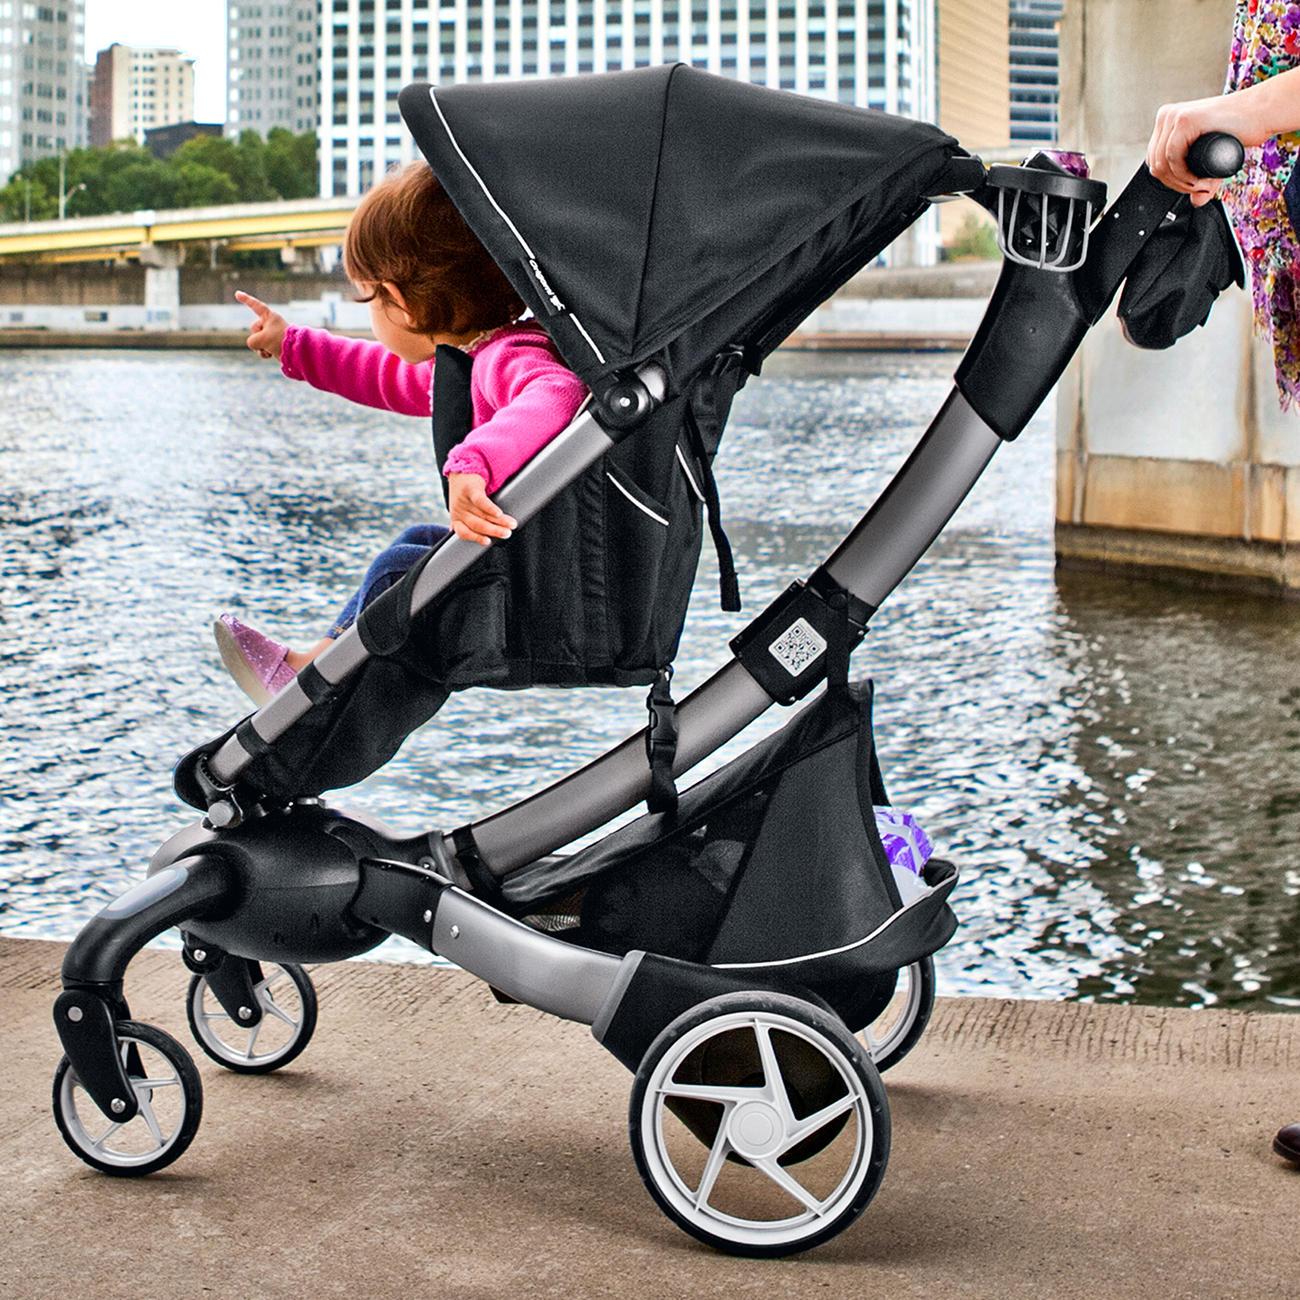 origami komfort kinderwagen buggy online kaufen. Black Bedroom Furniture Sets. Home Design Ideas